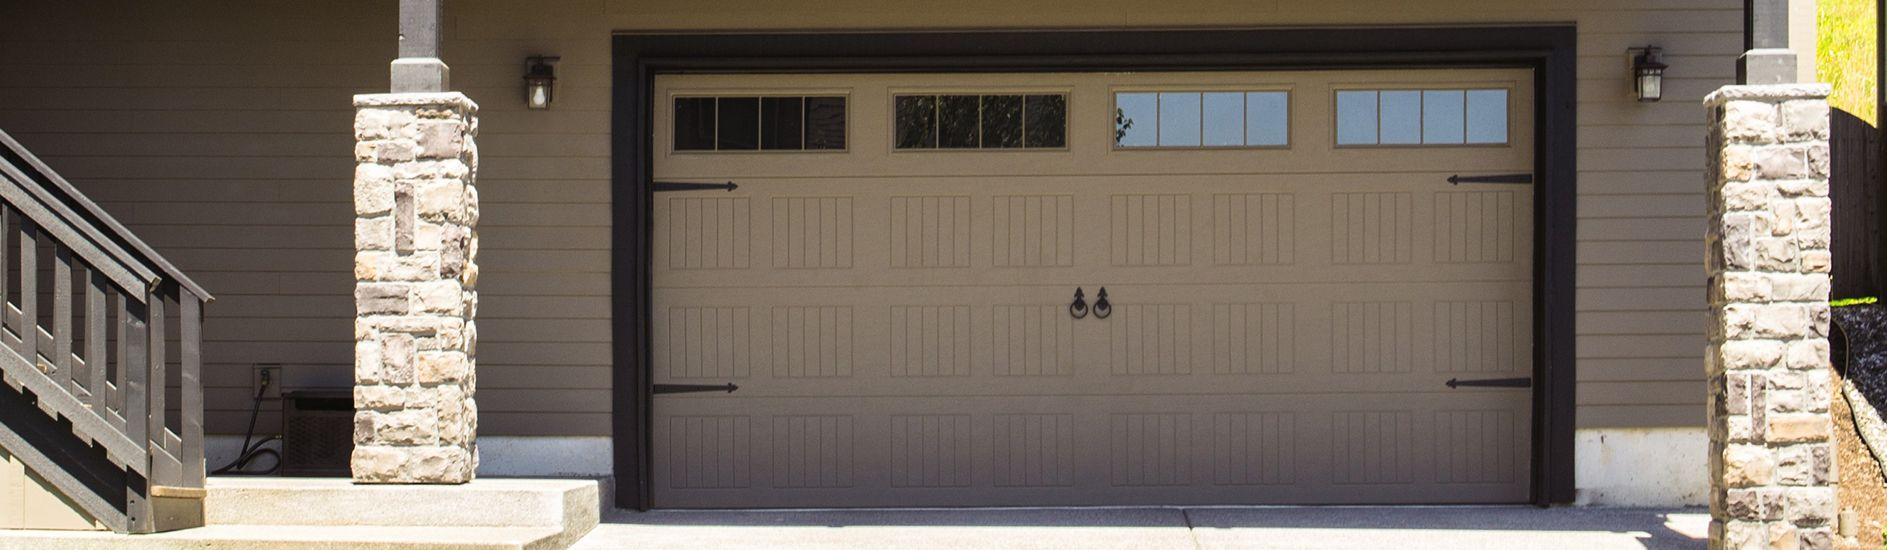 9100 9600 Steel Garage Door Sonoma Taupe Stockbridge Wayne